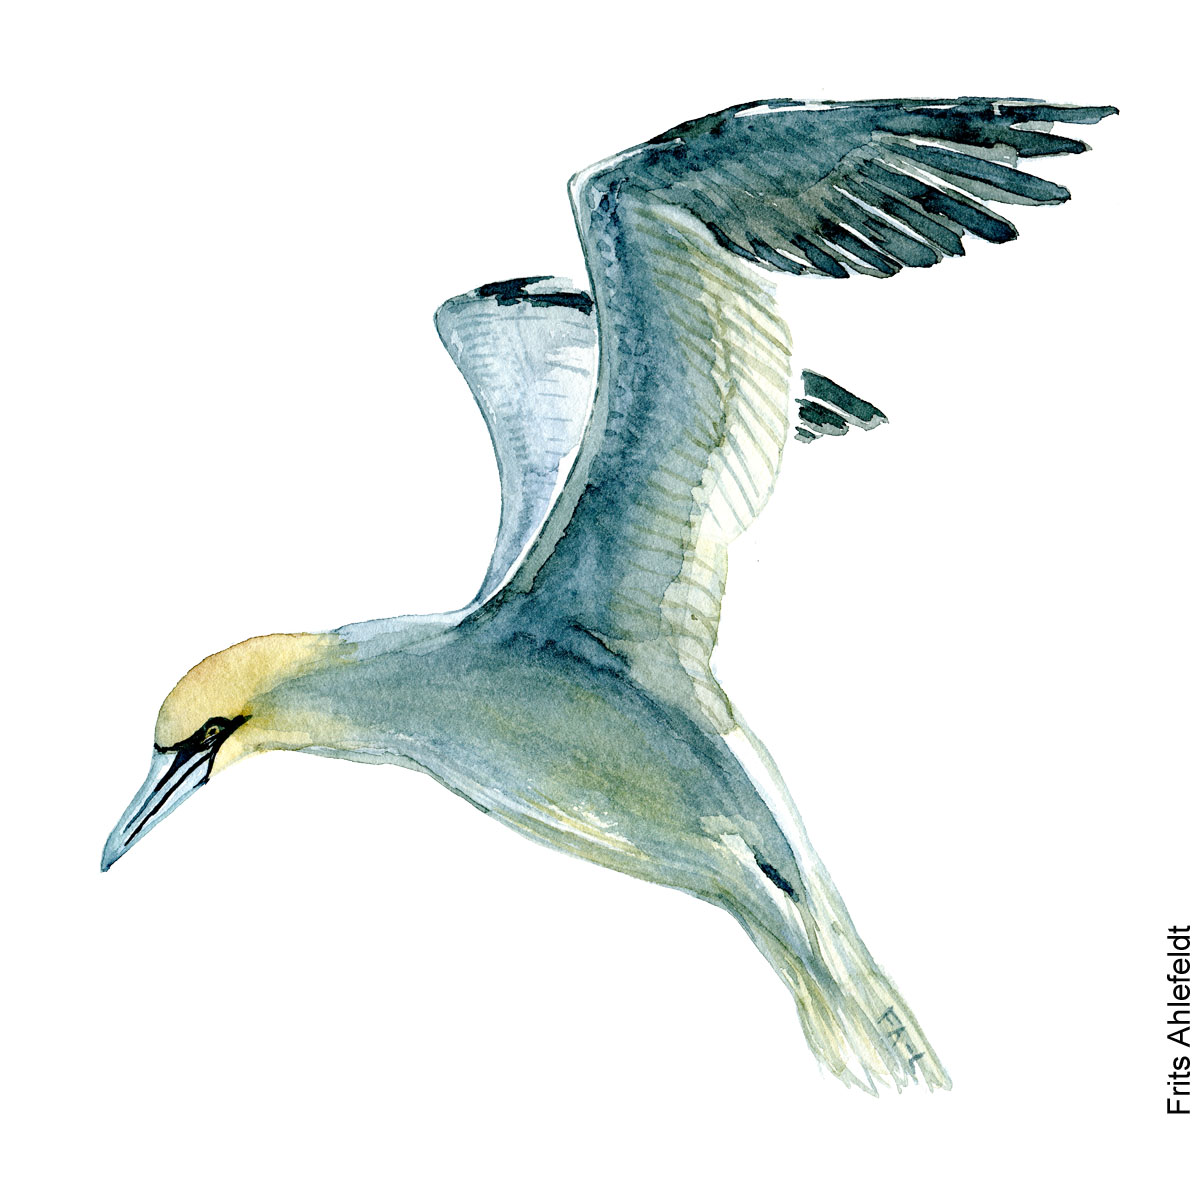 Northern gannet. Bird watercolor illustration handmade by Frits Ahlefeldt